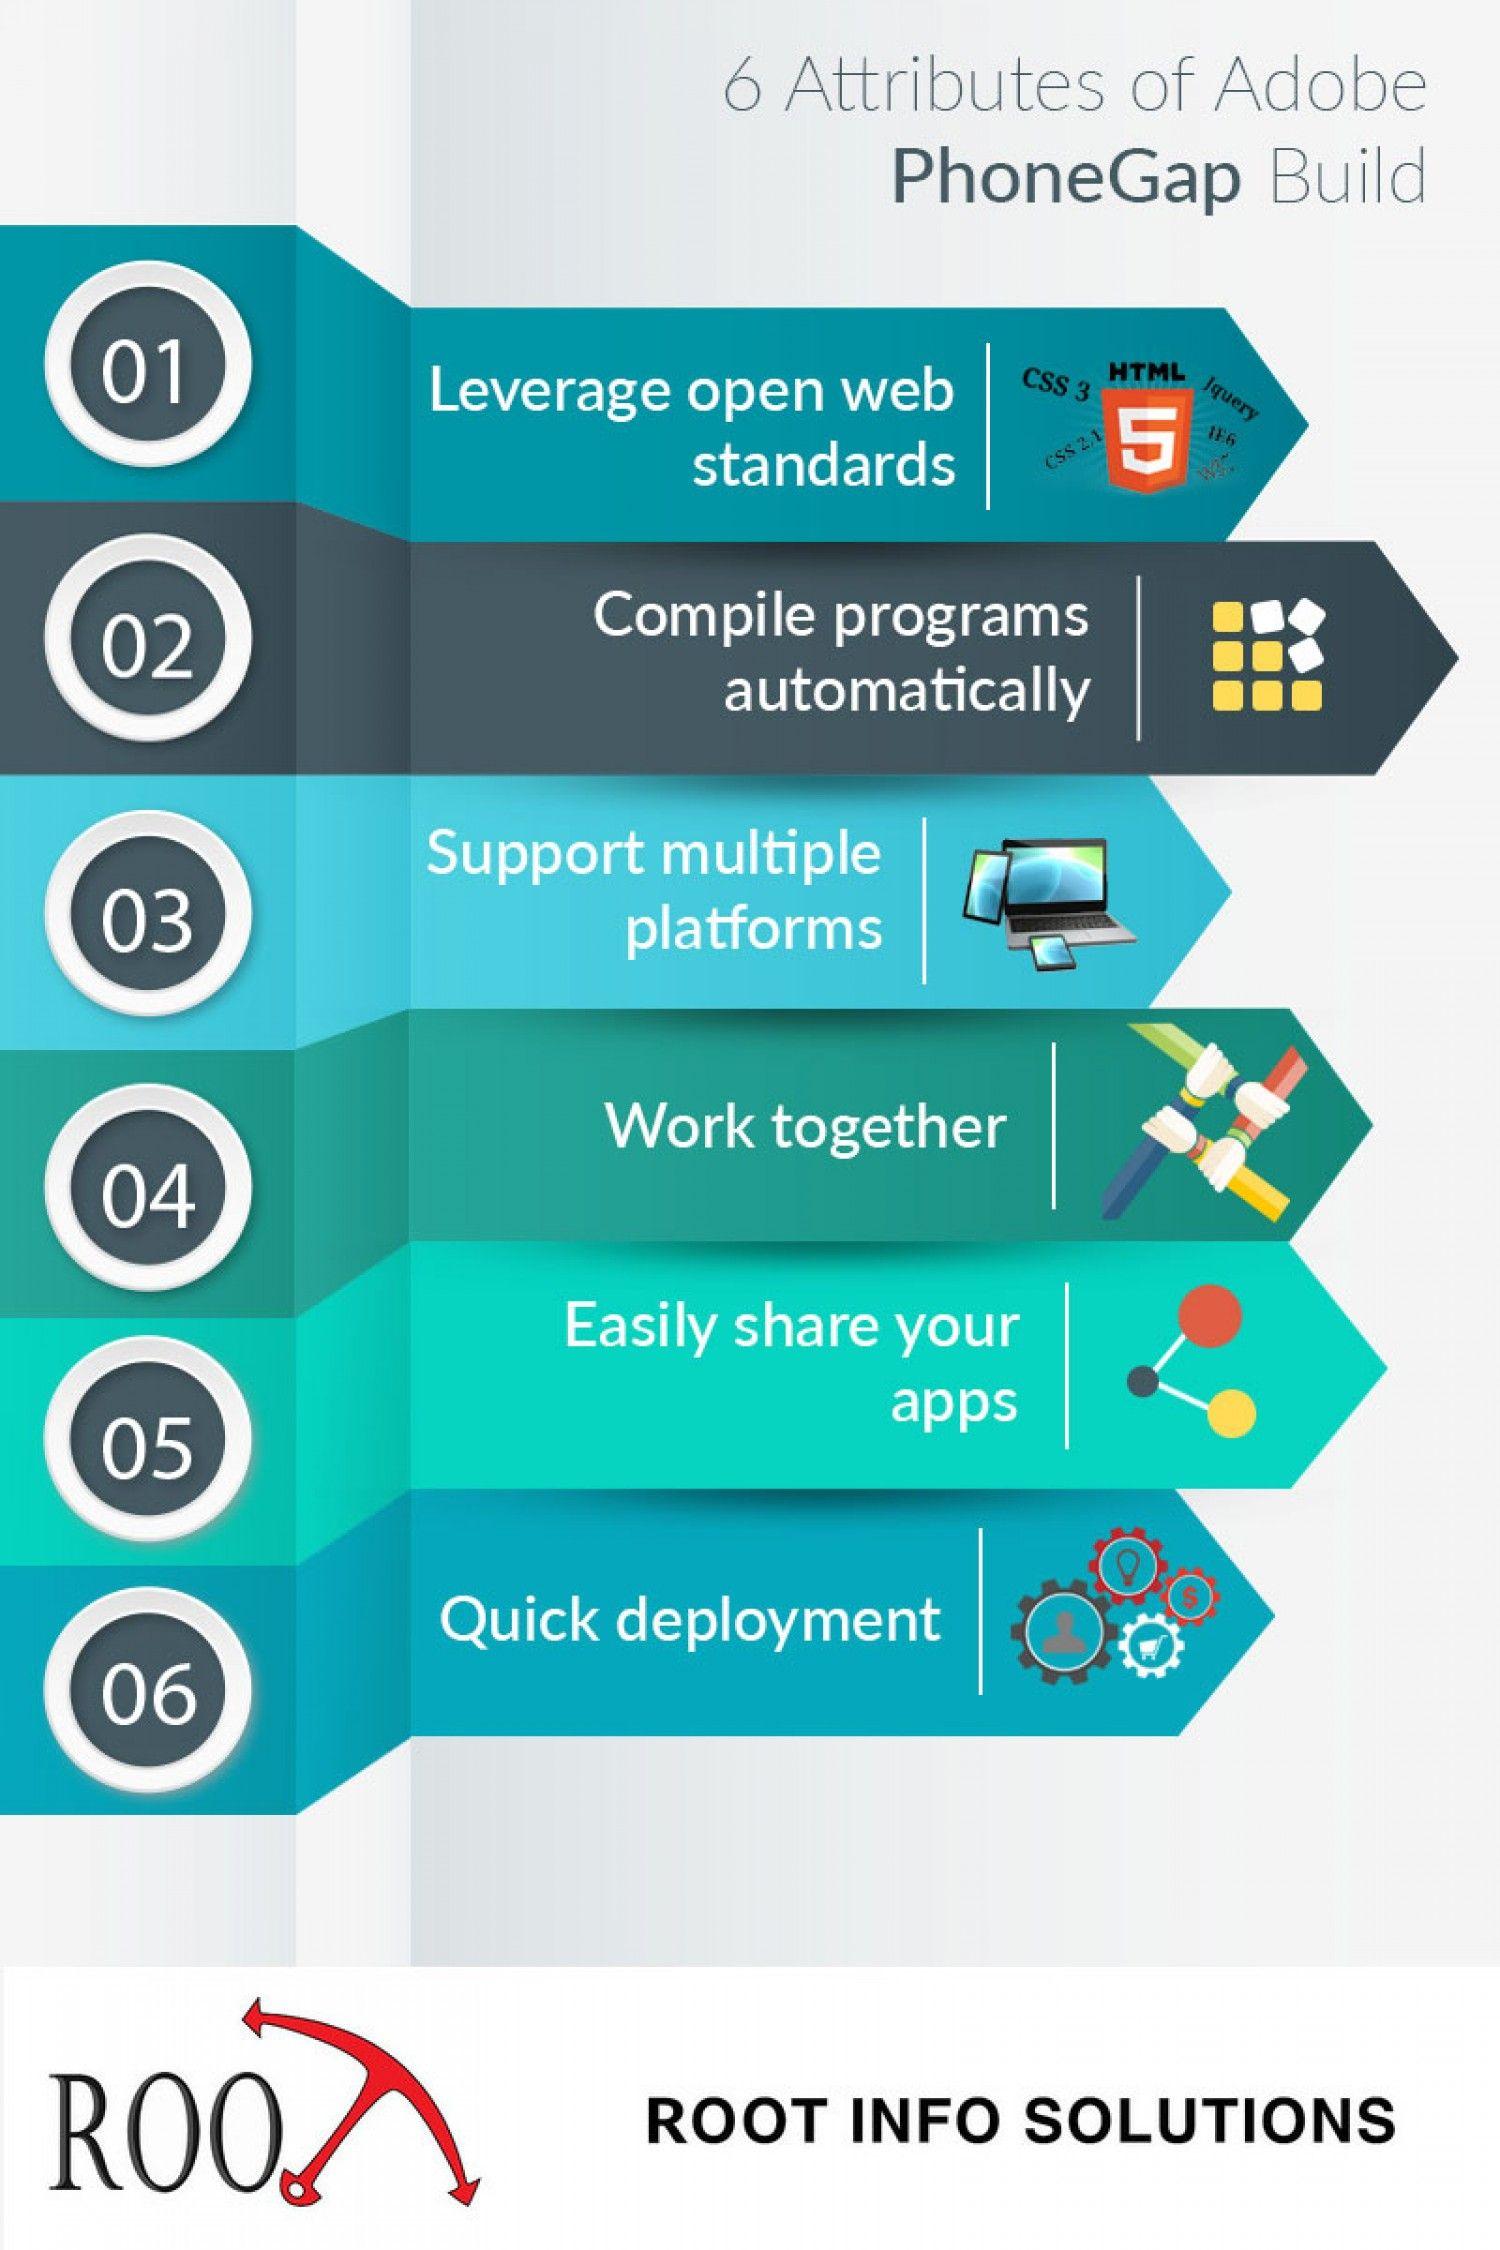 How Adobe Empowers a #PhoneGap App Development Company